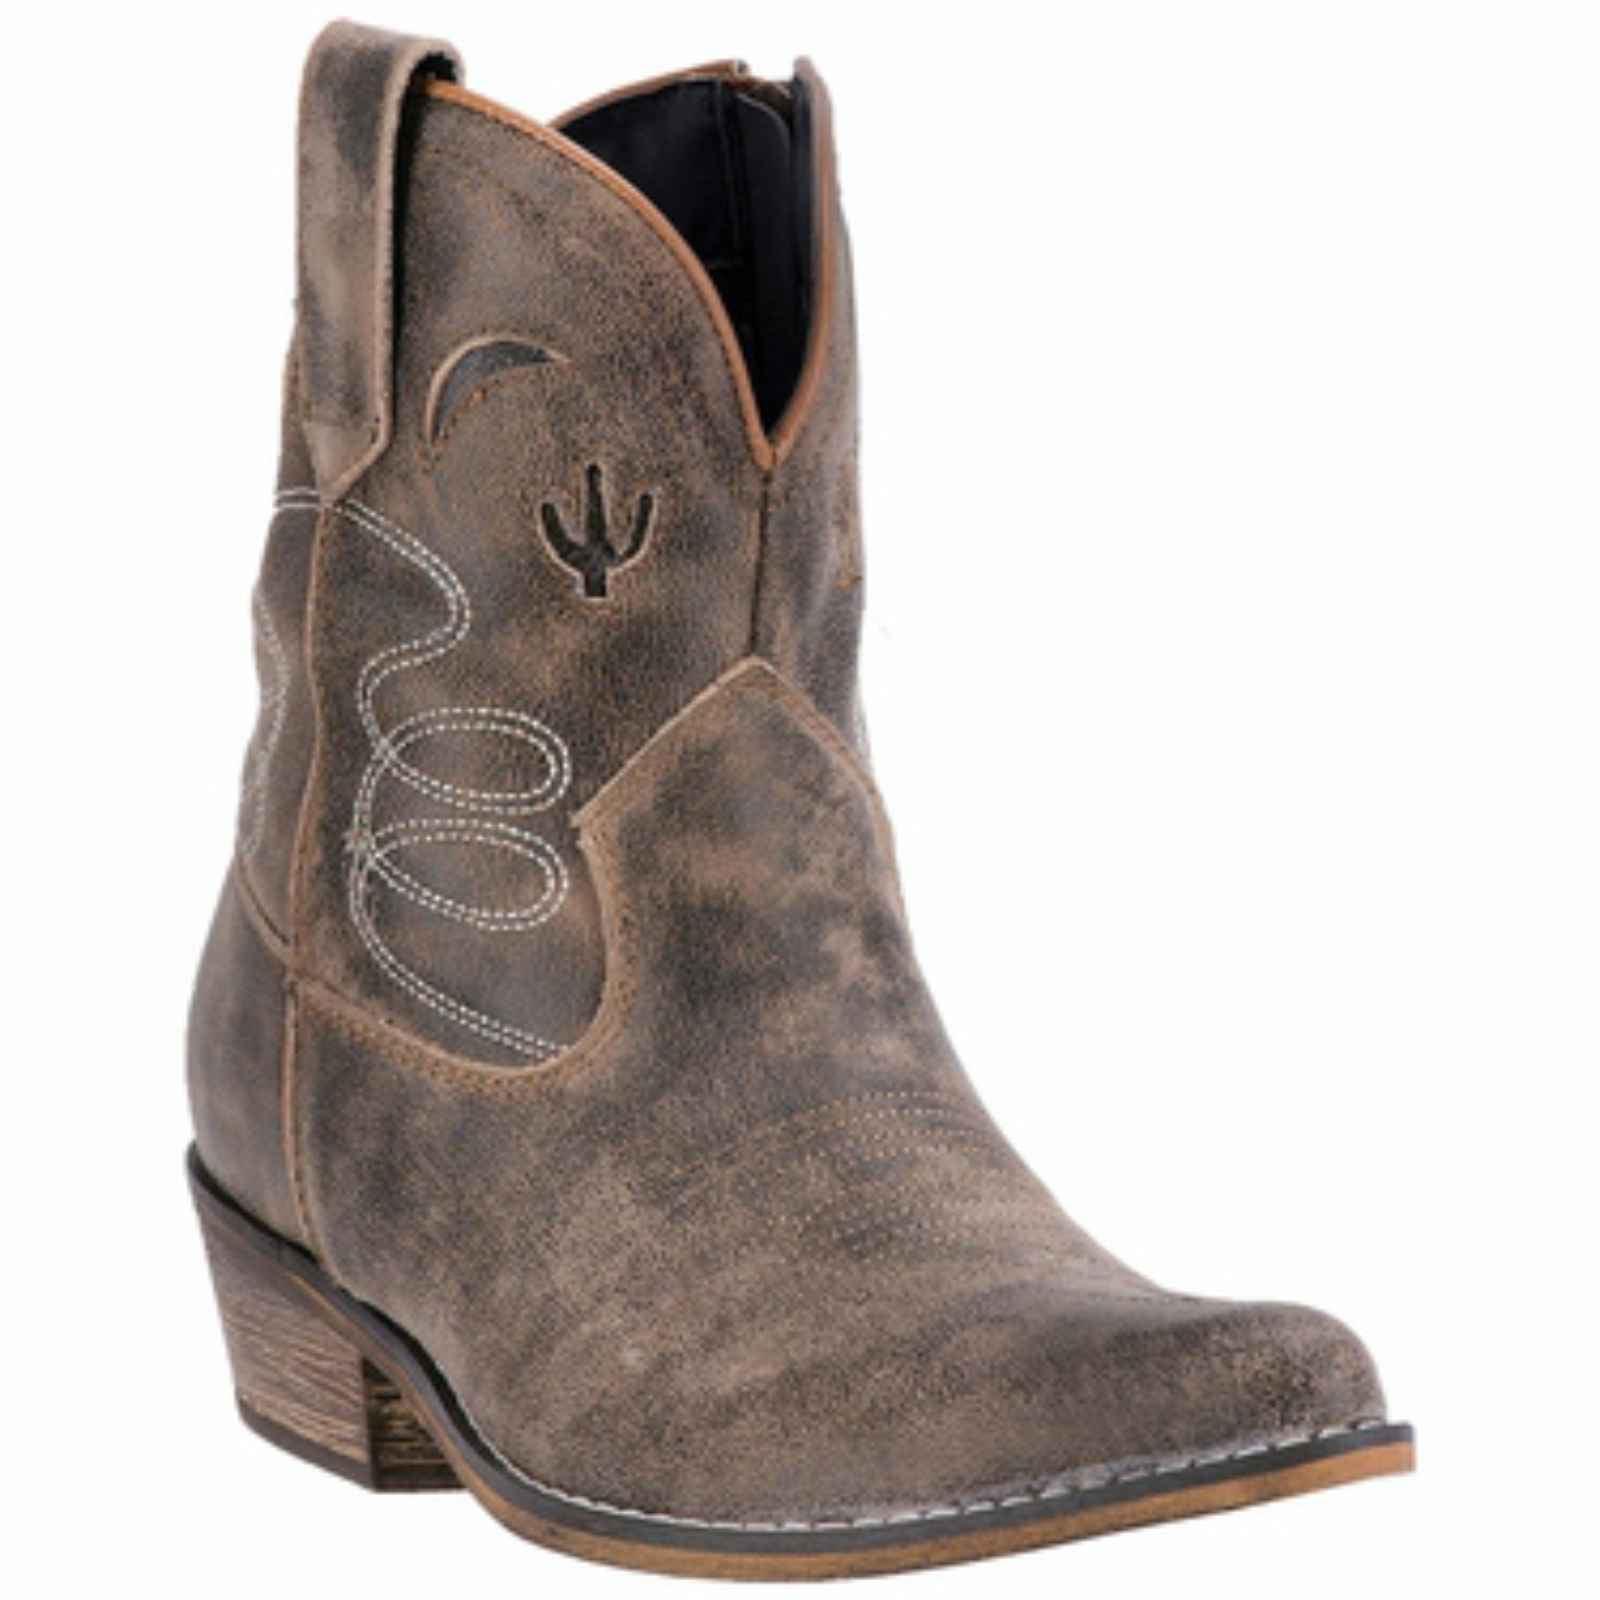 "Dan Post Ladies 7"" Taupe Leather Boot Cactus Moon, DI 696 by Dingo"